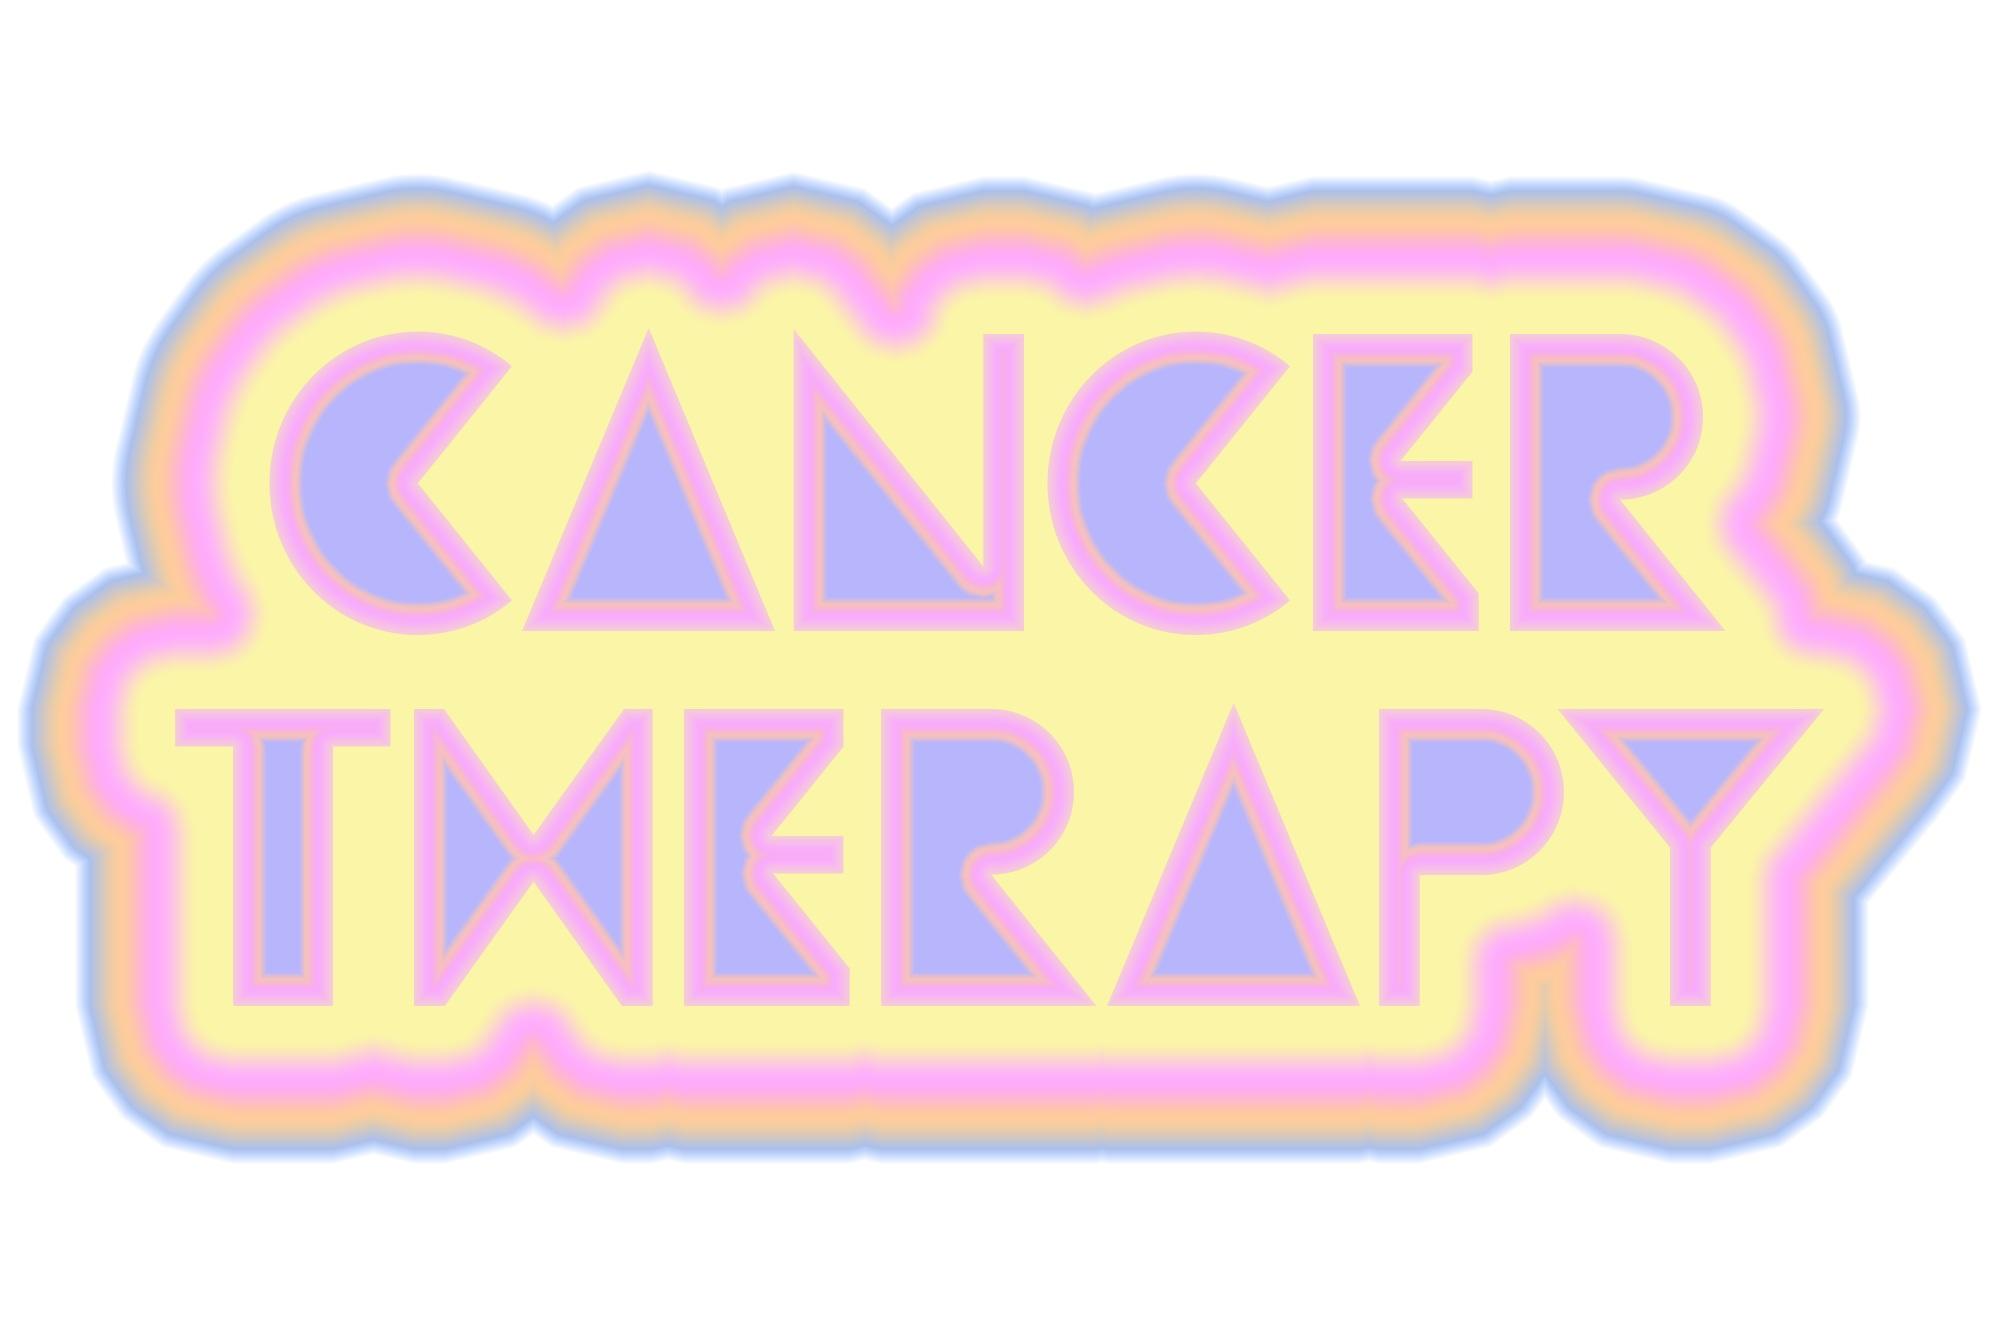 CancerTherapy.jpg